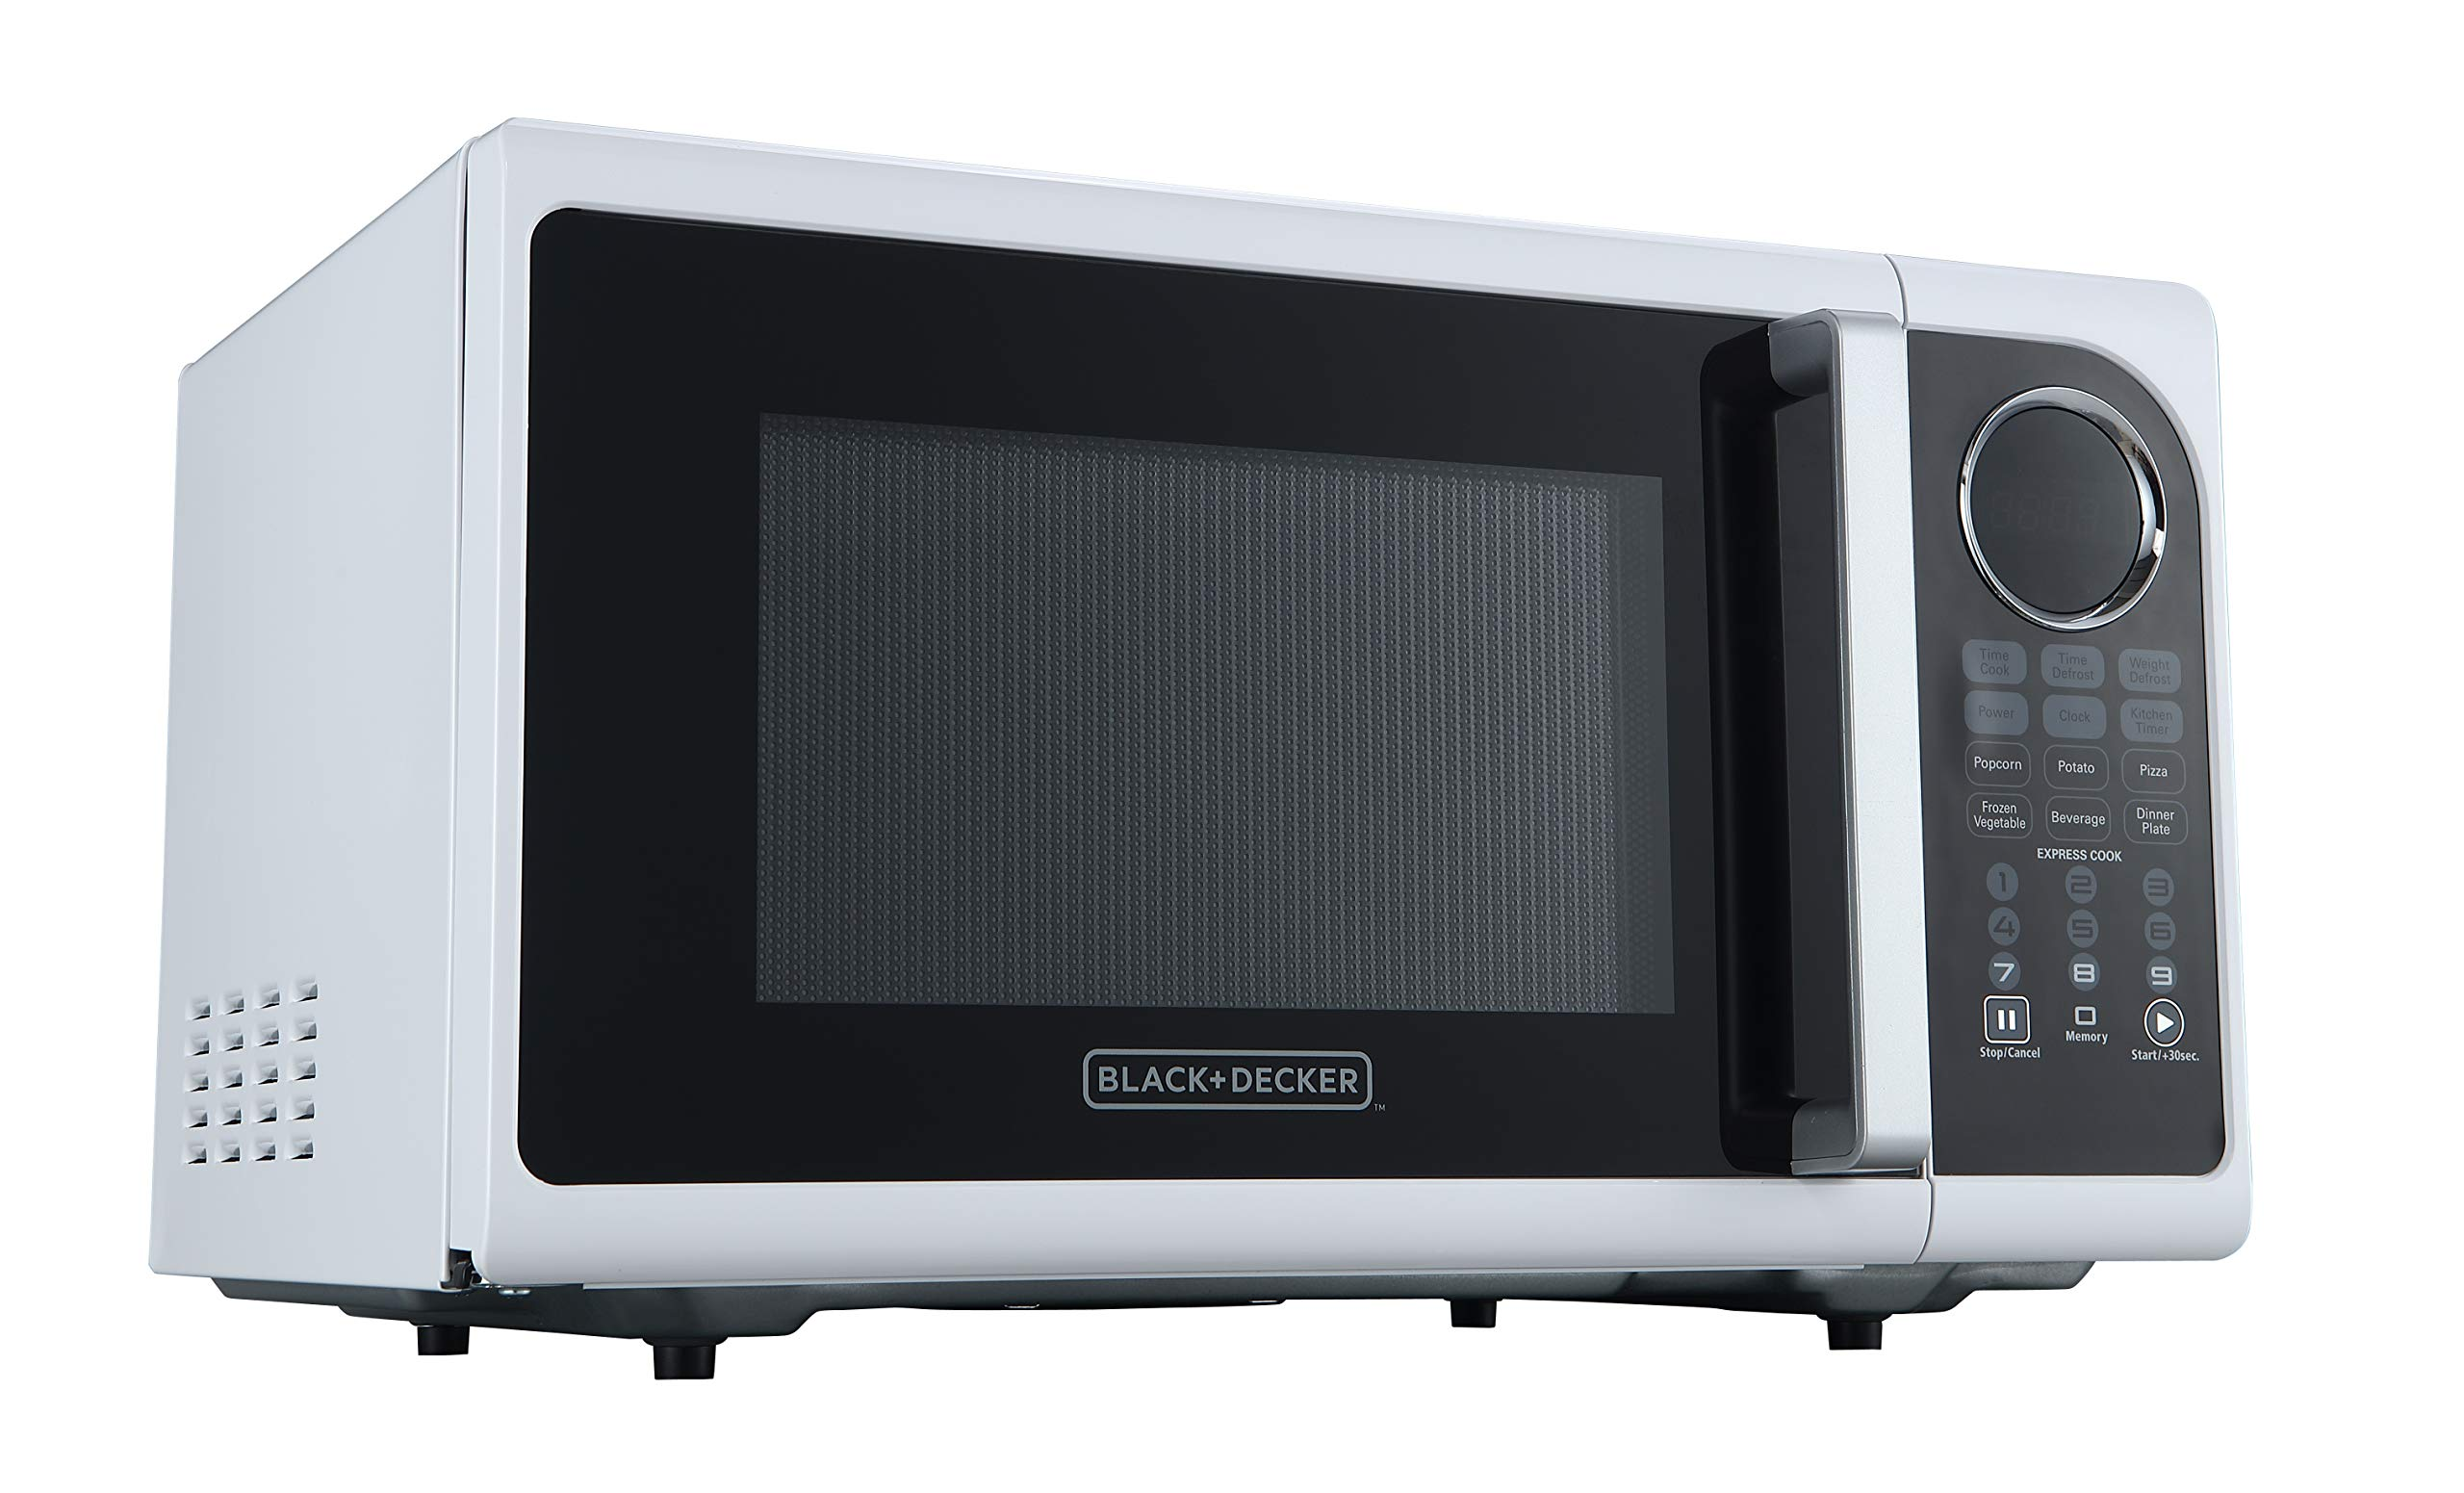 Black+Decker EM925ACP-P1 0.9 Cu. Ft. Digital Microwave, White by BLACK+DECKER (Image #2)